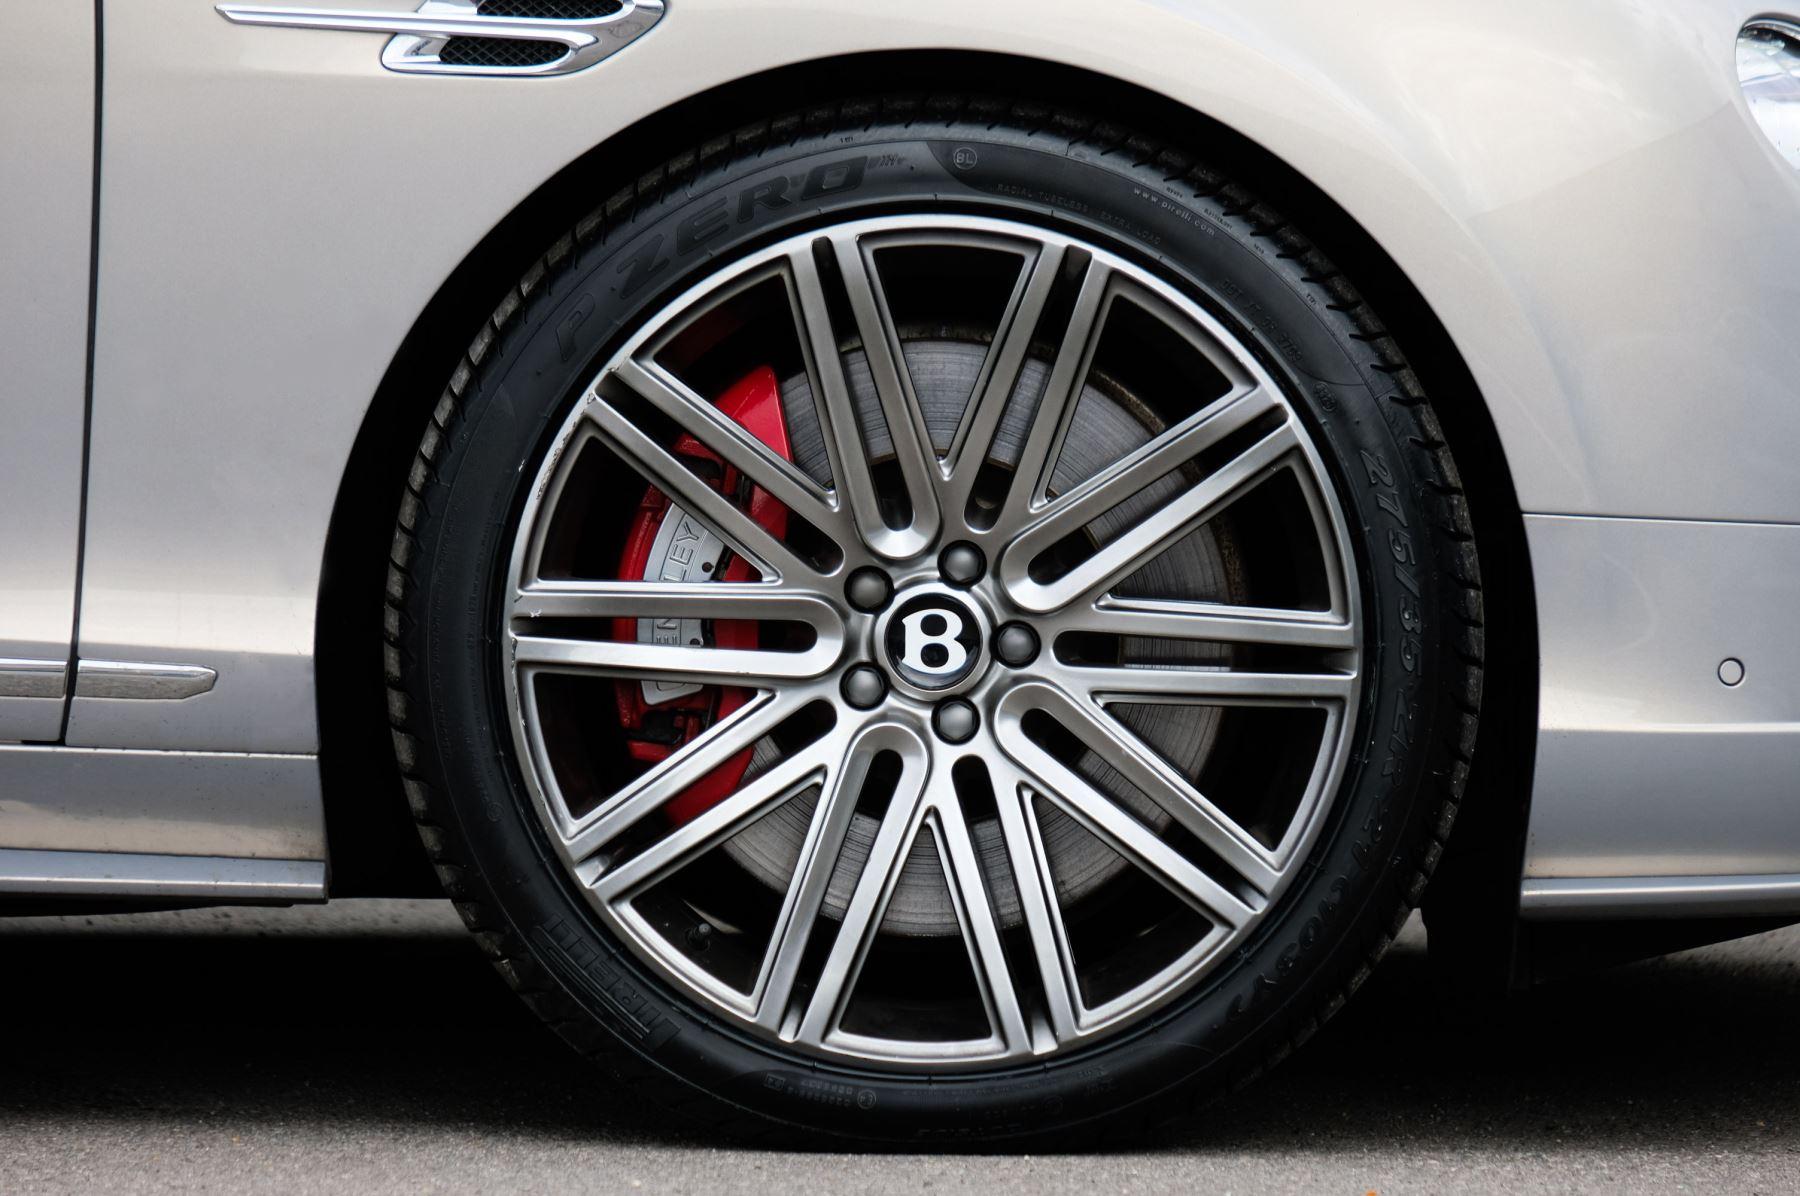 Bentley Continental GT 6.0 W12 [635] Speed - Premier Specification - Carbon Fibre Fascia Panels image 10